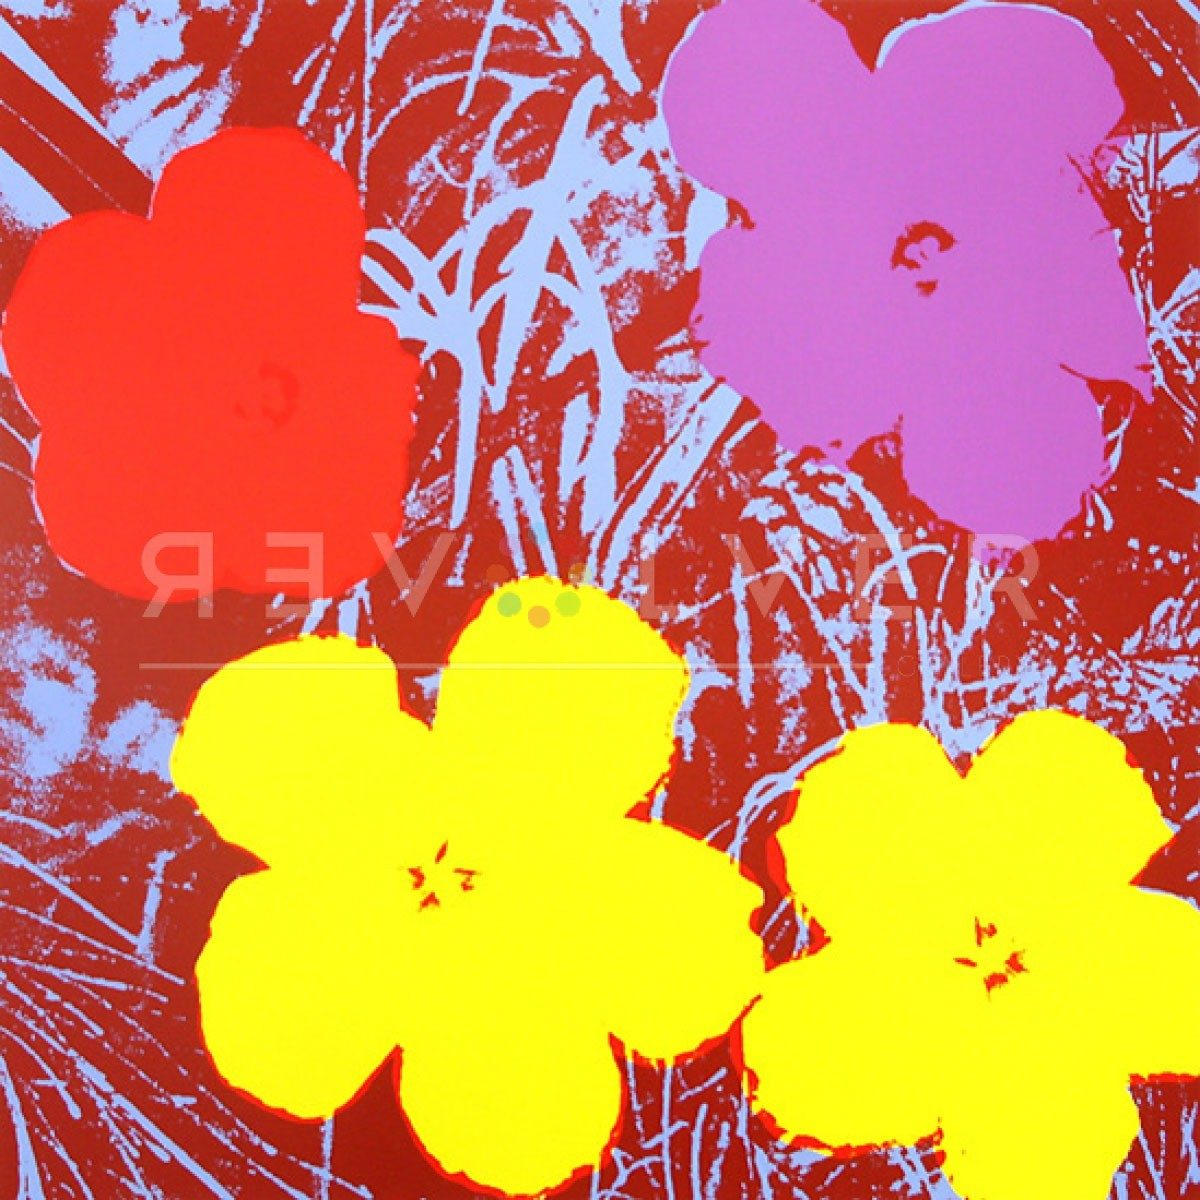 Andy Warhol Flowers 71